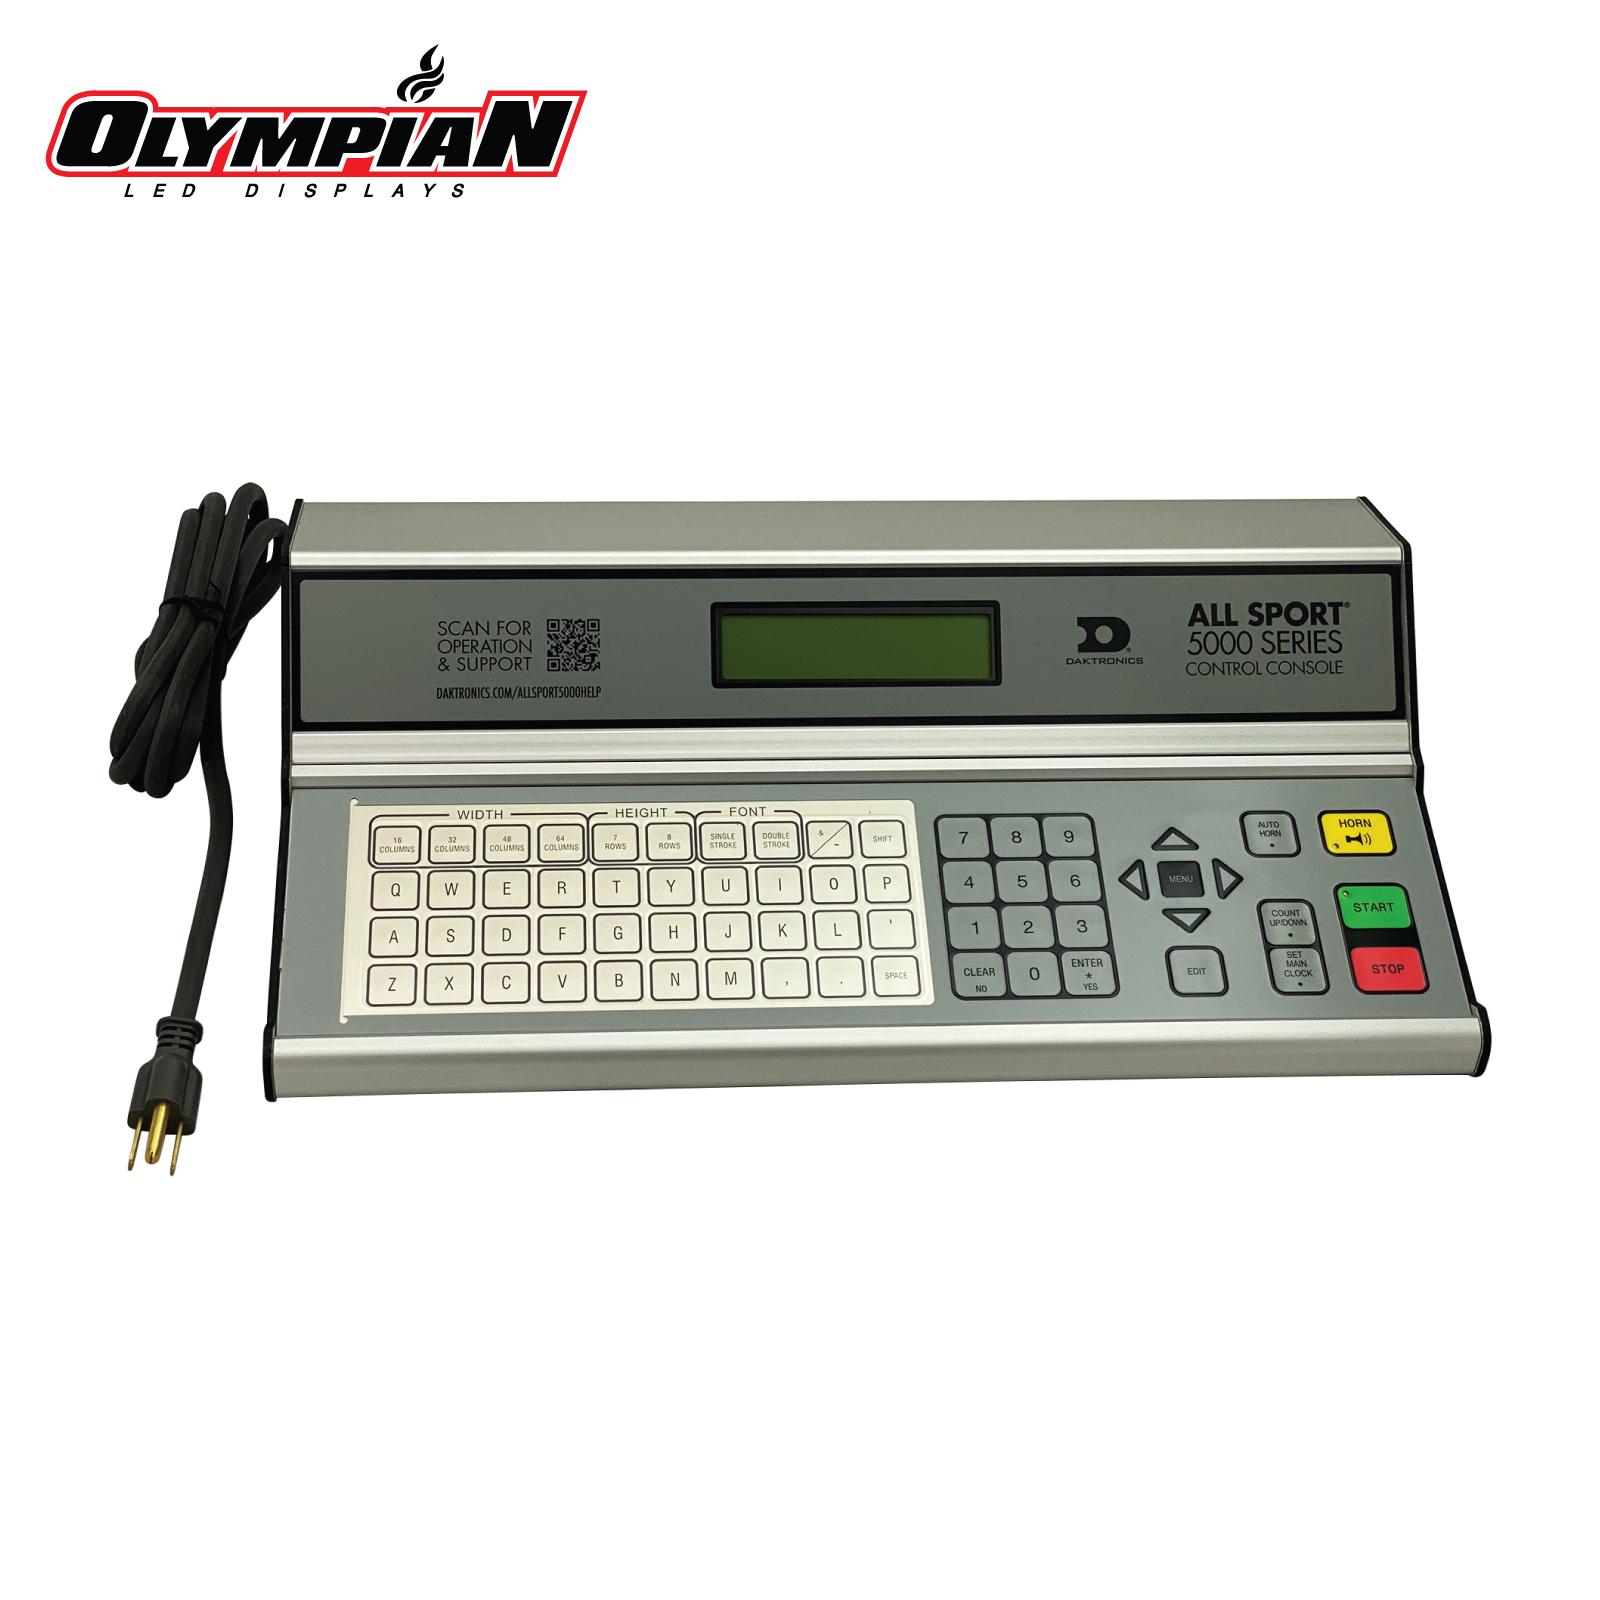 Daktronics All Sport 5000 Series Control Console (0A-1196-0001)